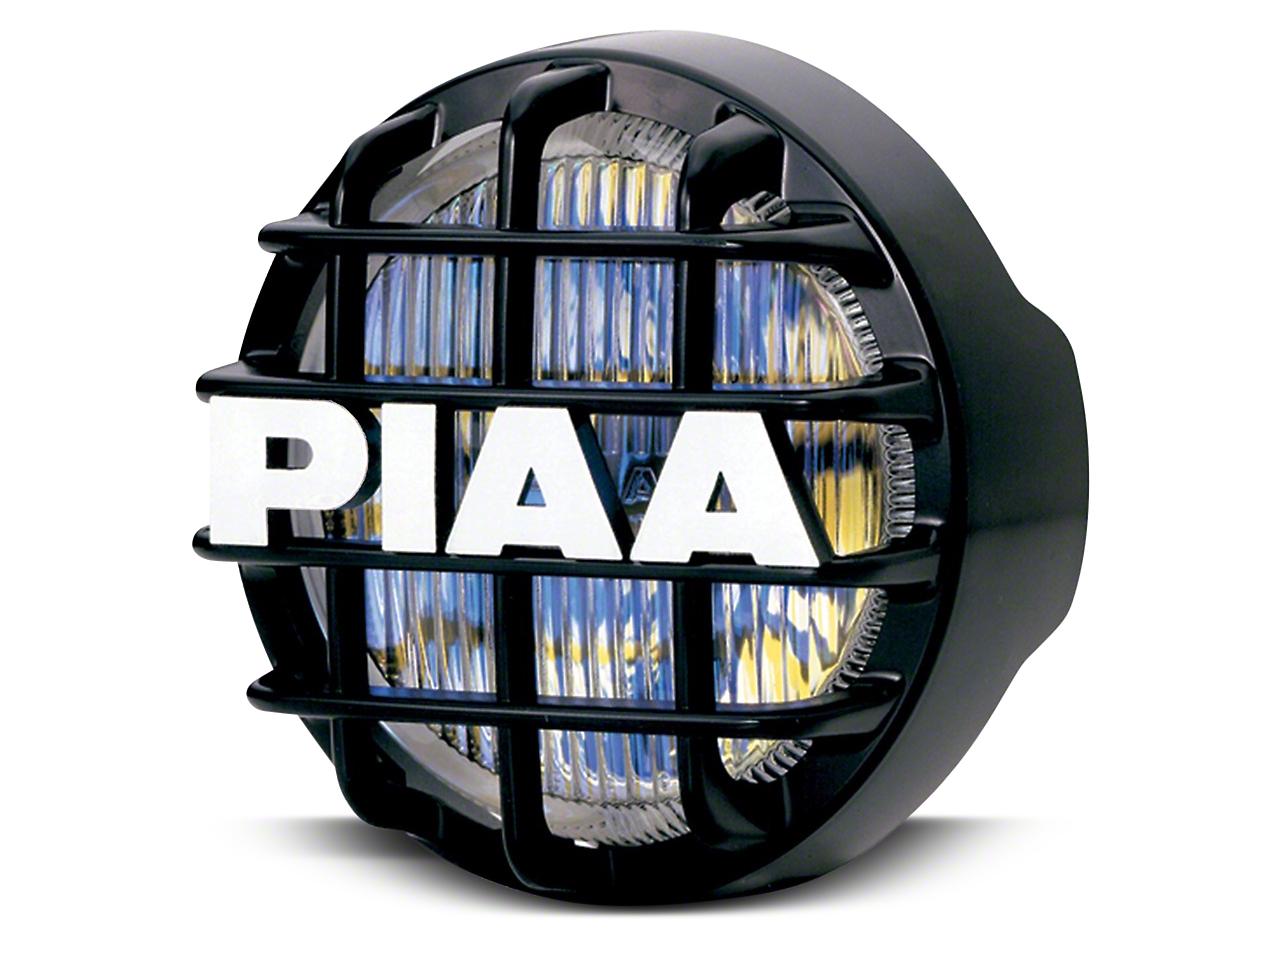 PIAA 510 Series 4 in. Round Ion Yellow Halogen Light - Fog Beam